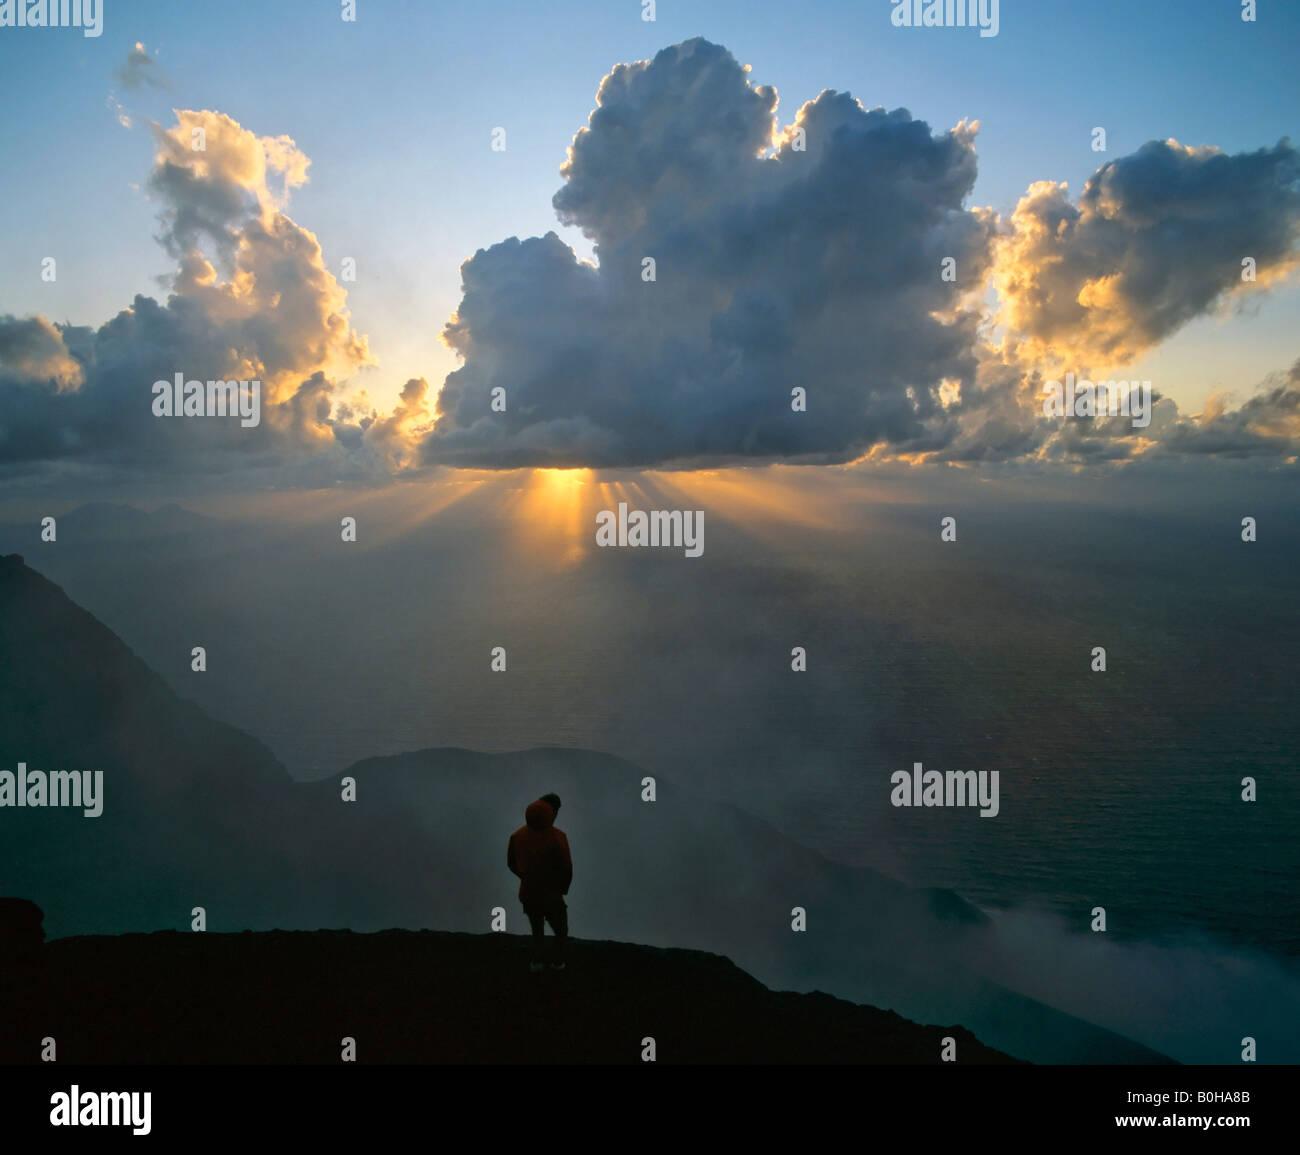 Peak of Stromboli Volcano, man standing in backlight, sunbeams, rays of sunlight, Aeolian Islands, Sicily, Italy Stock Photo